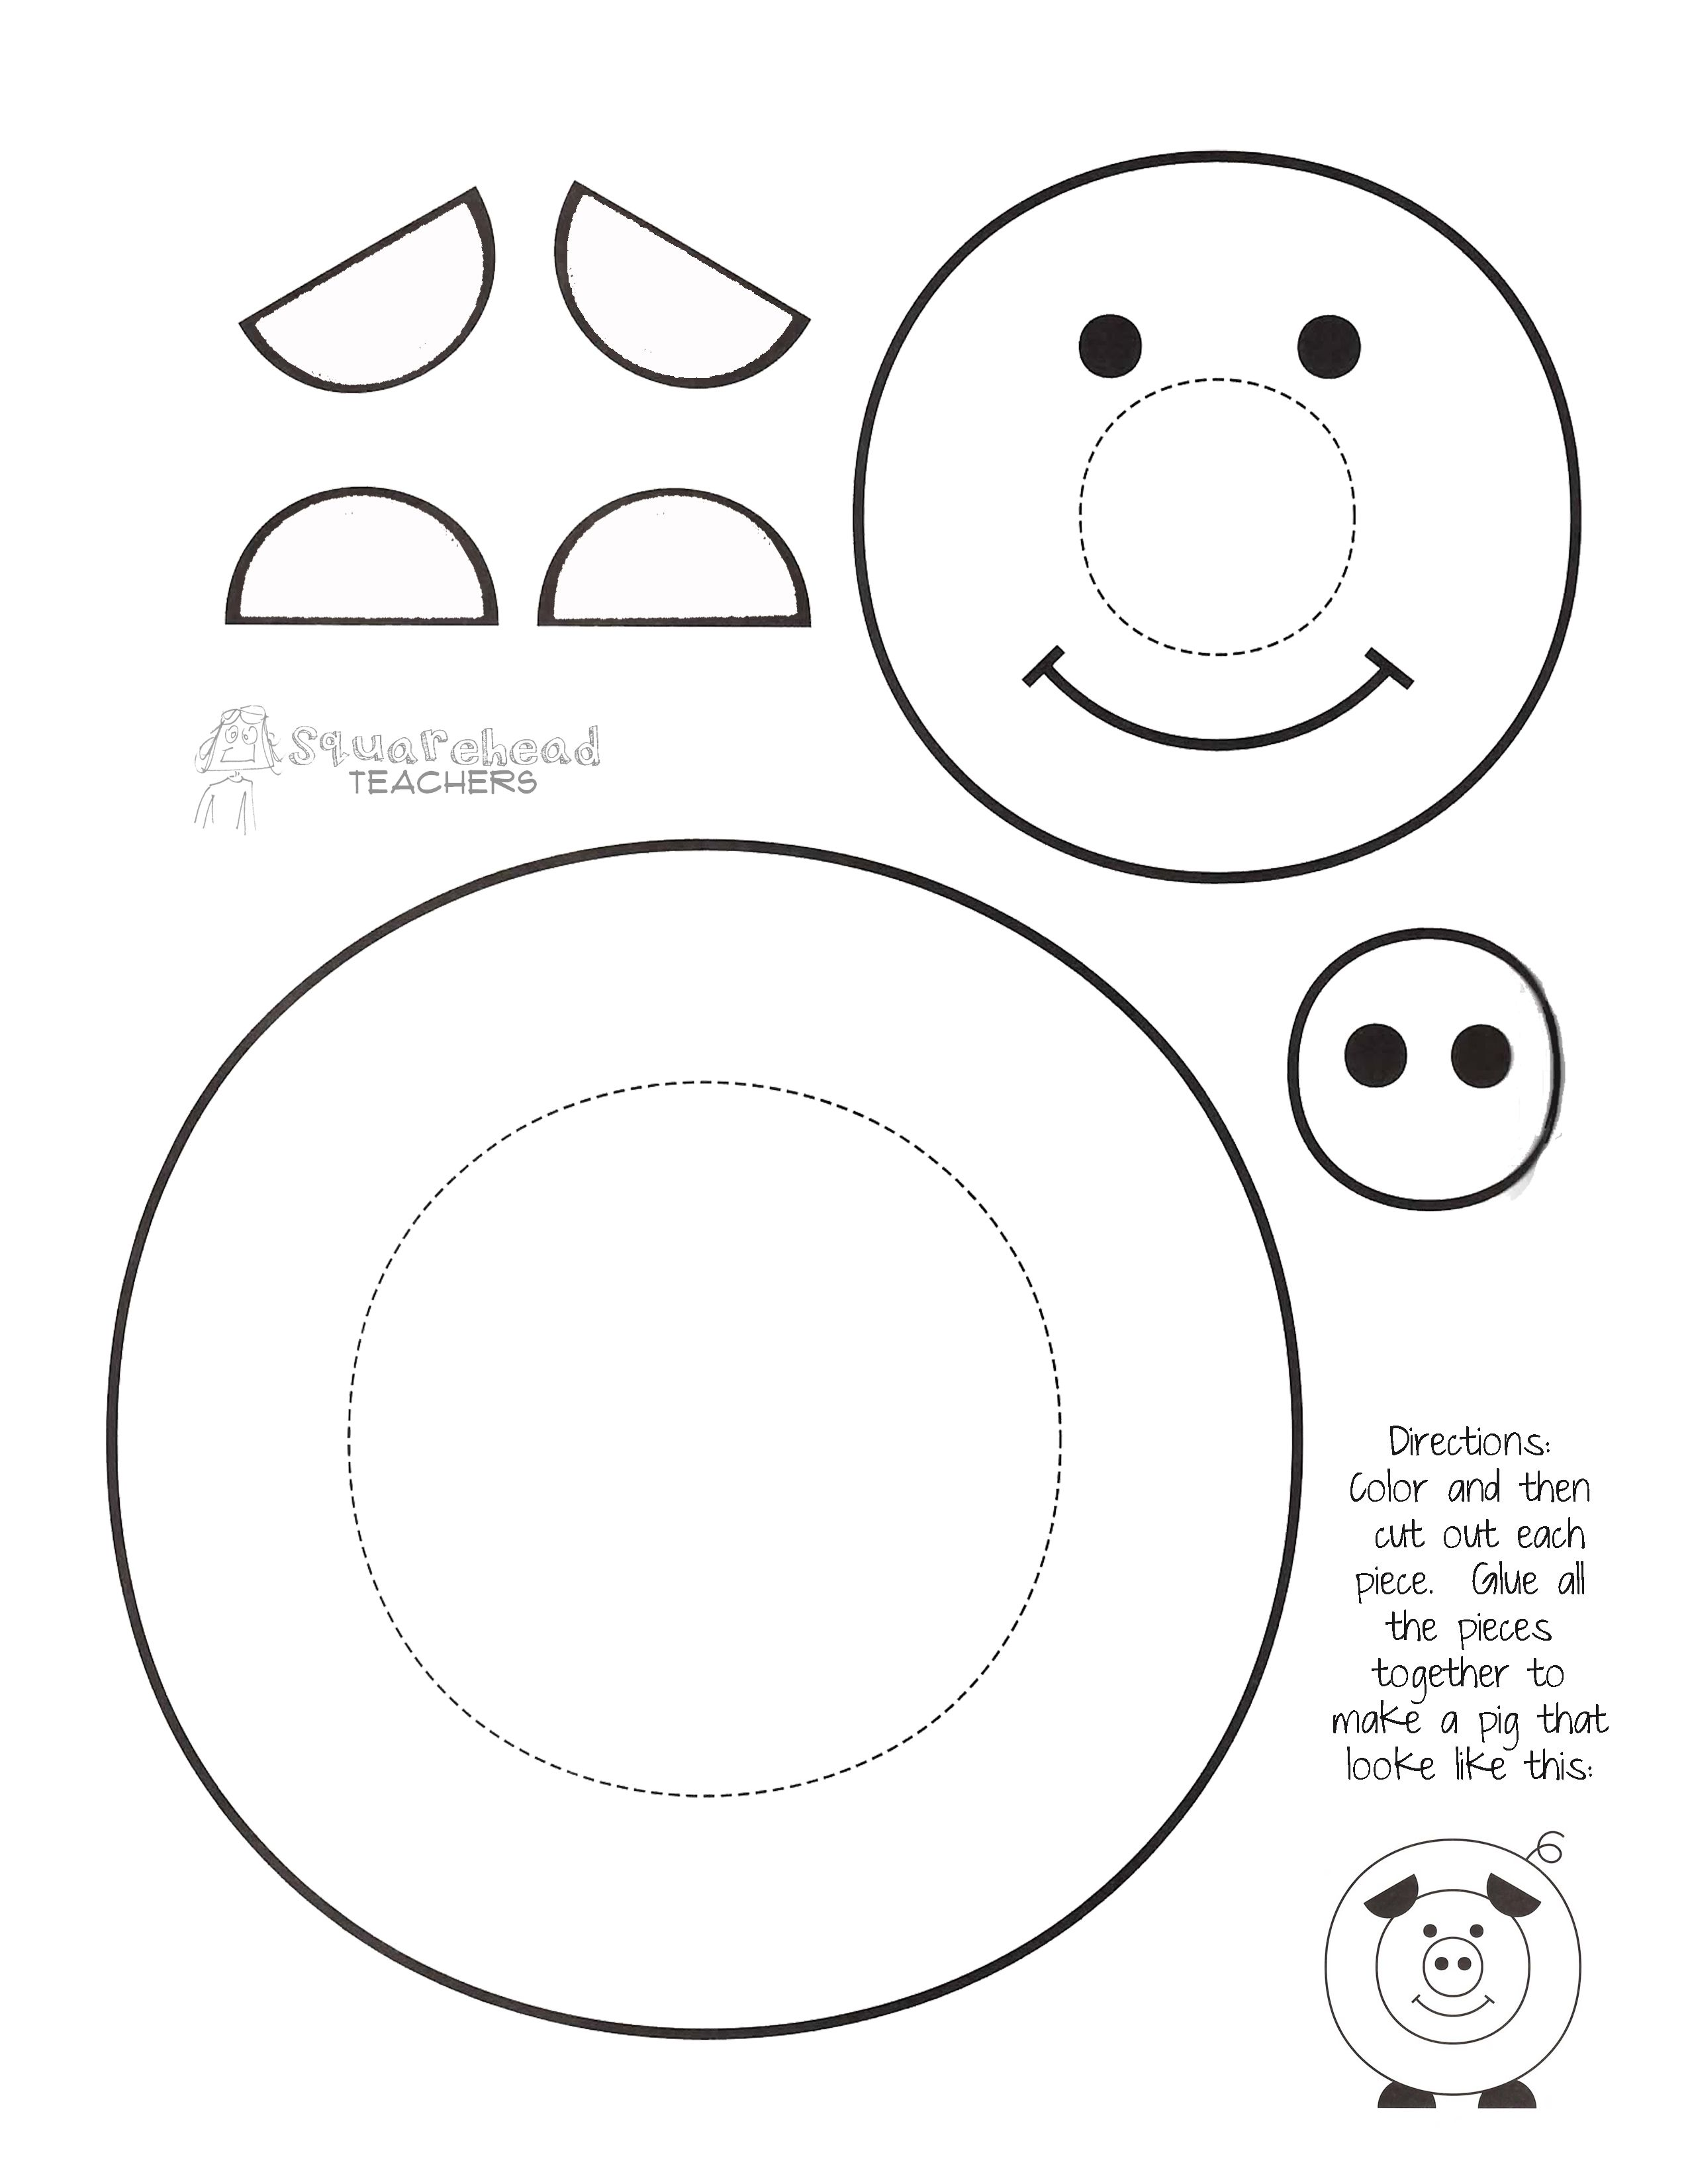 Pin By Carla Bo On Thema Varkens Kleuters Pig Theme Preschool Pig Crafts Printable Crafts Preschool Crafts